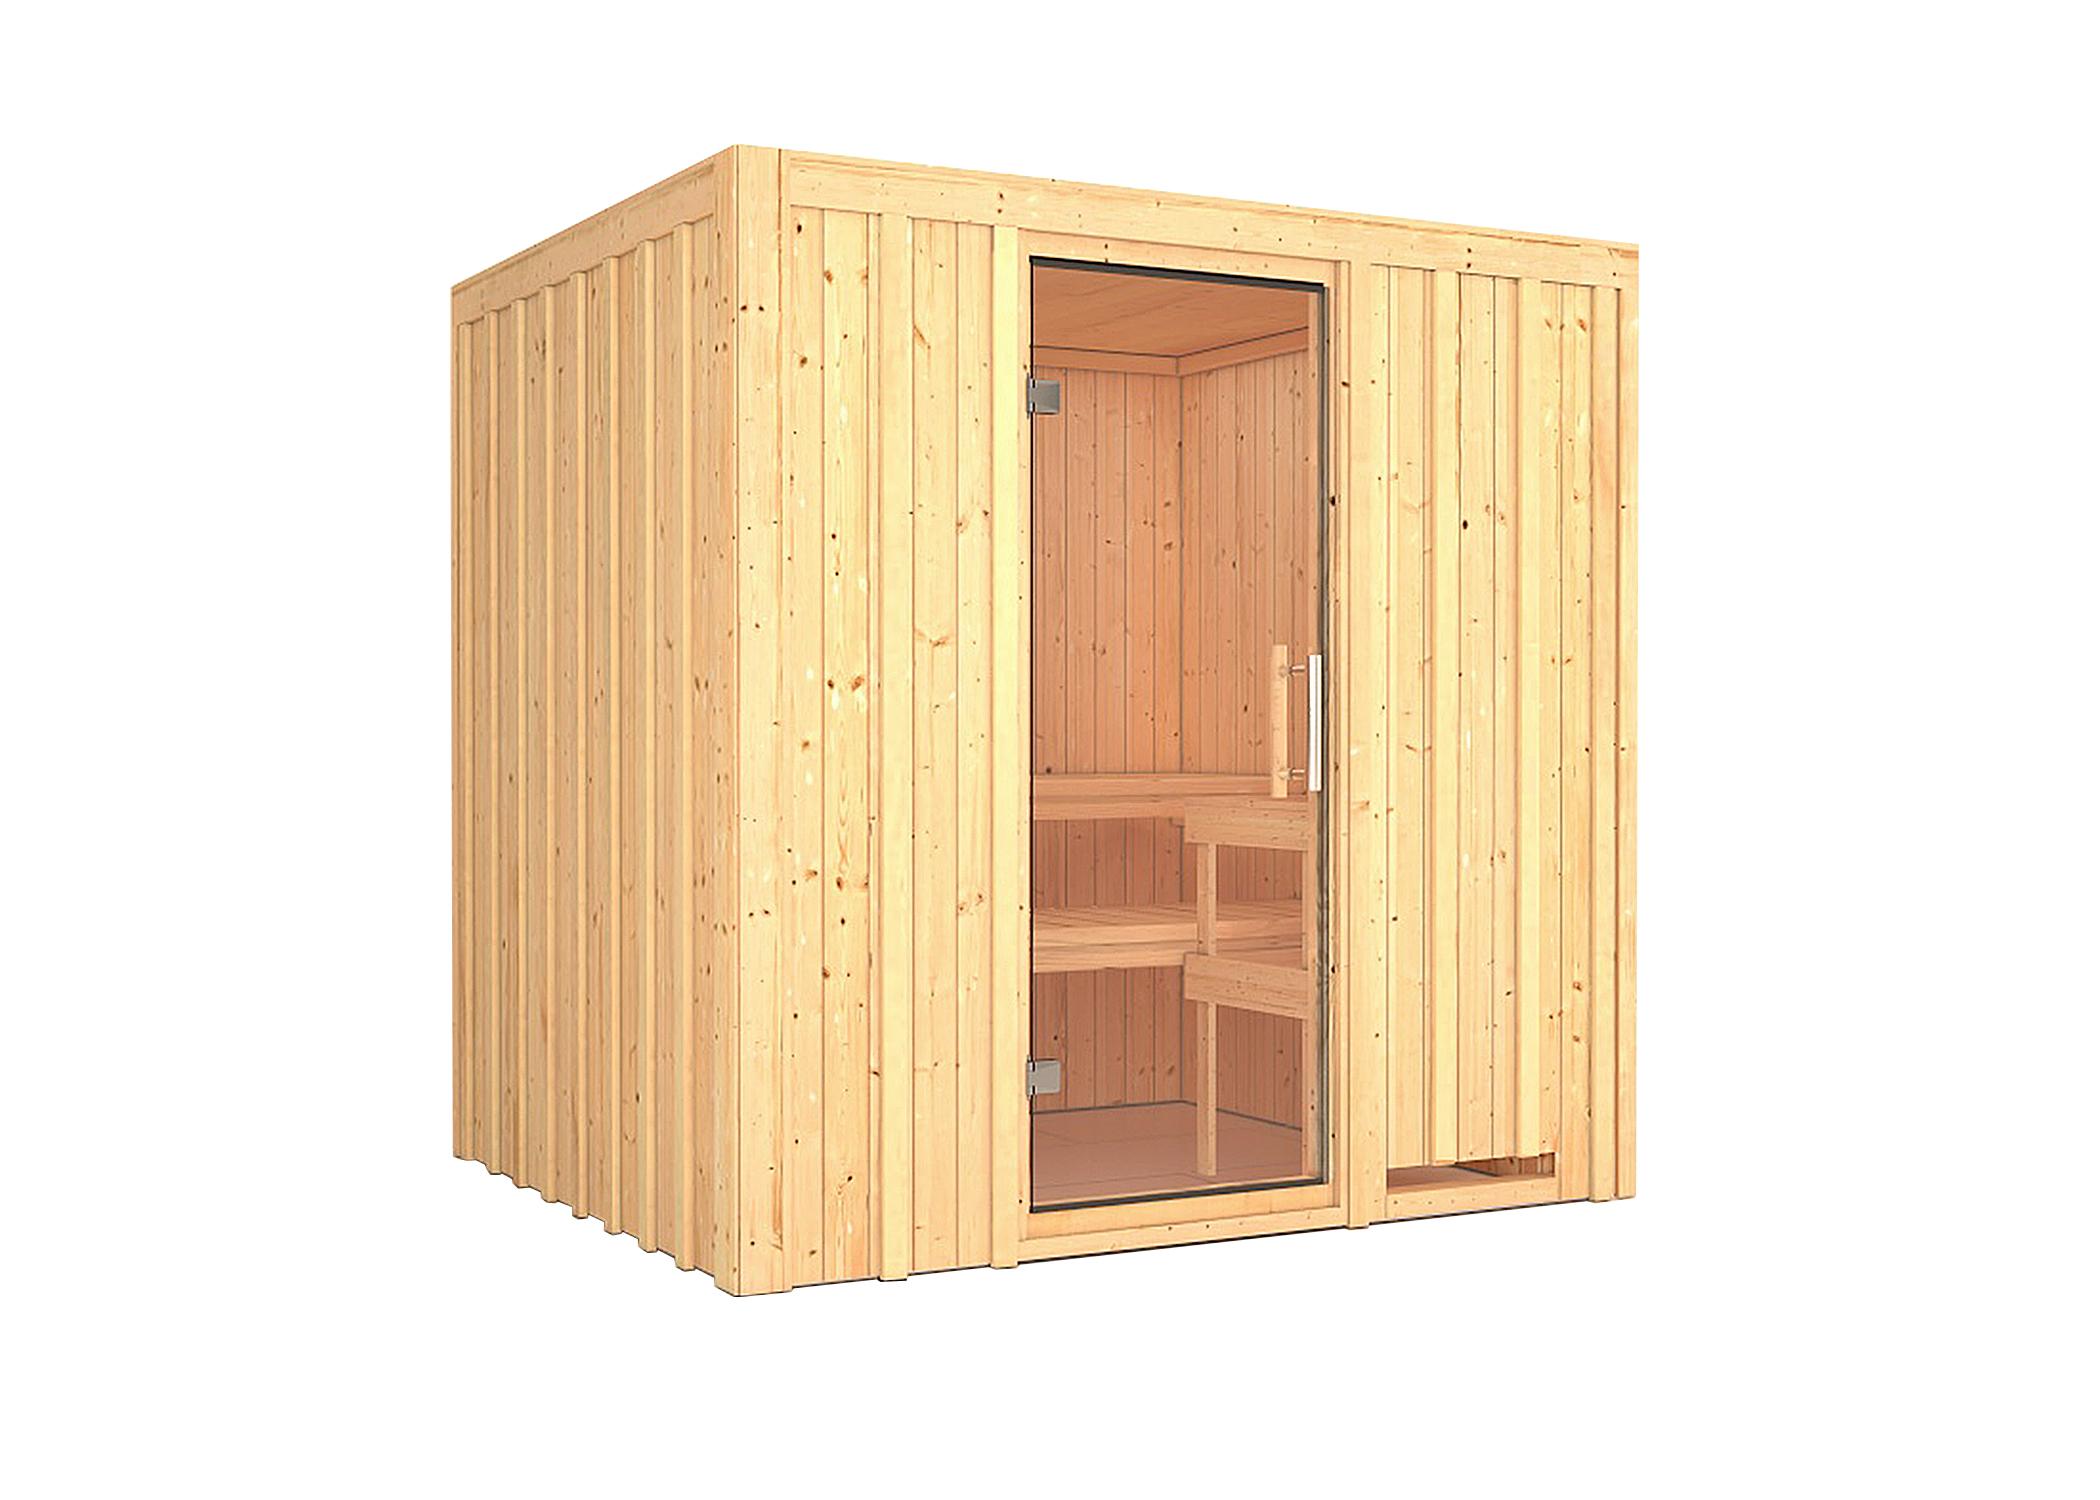 auto dachbox md3 178 x 52 x 35 gep ck dachkoffer in black. Black Bedroom Furniture Sets. Home Design Ideas